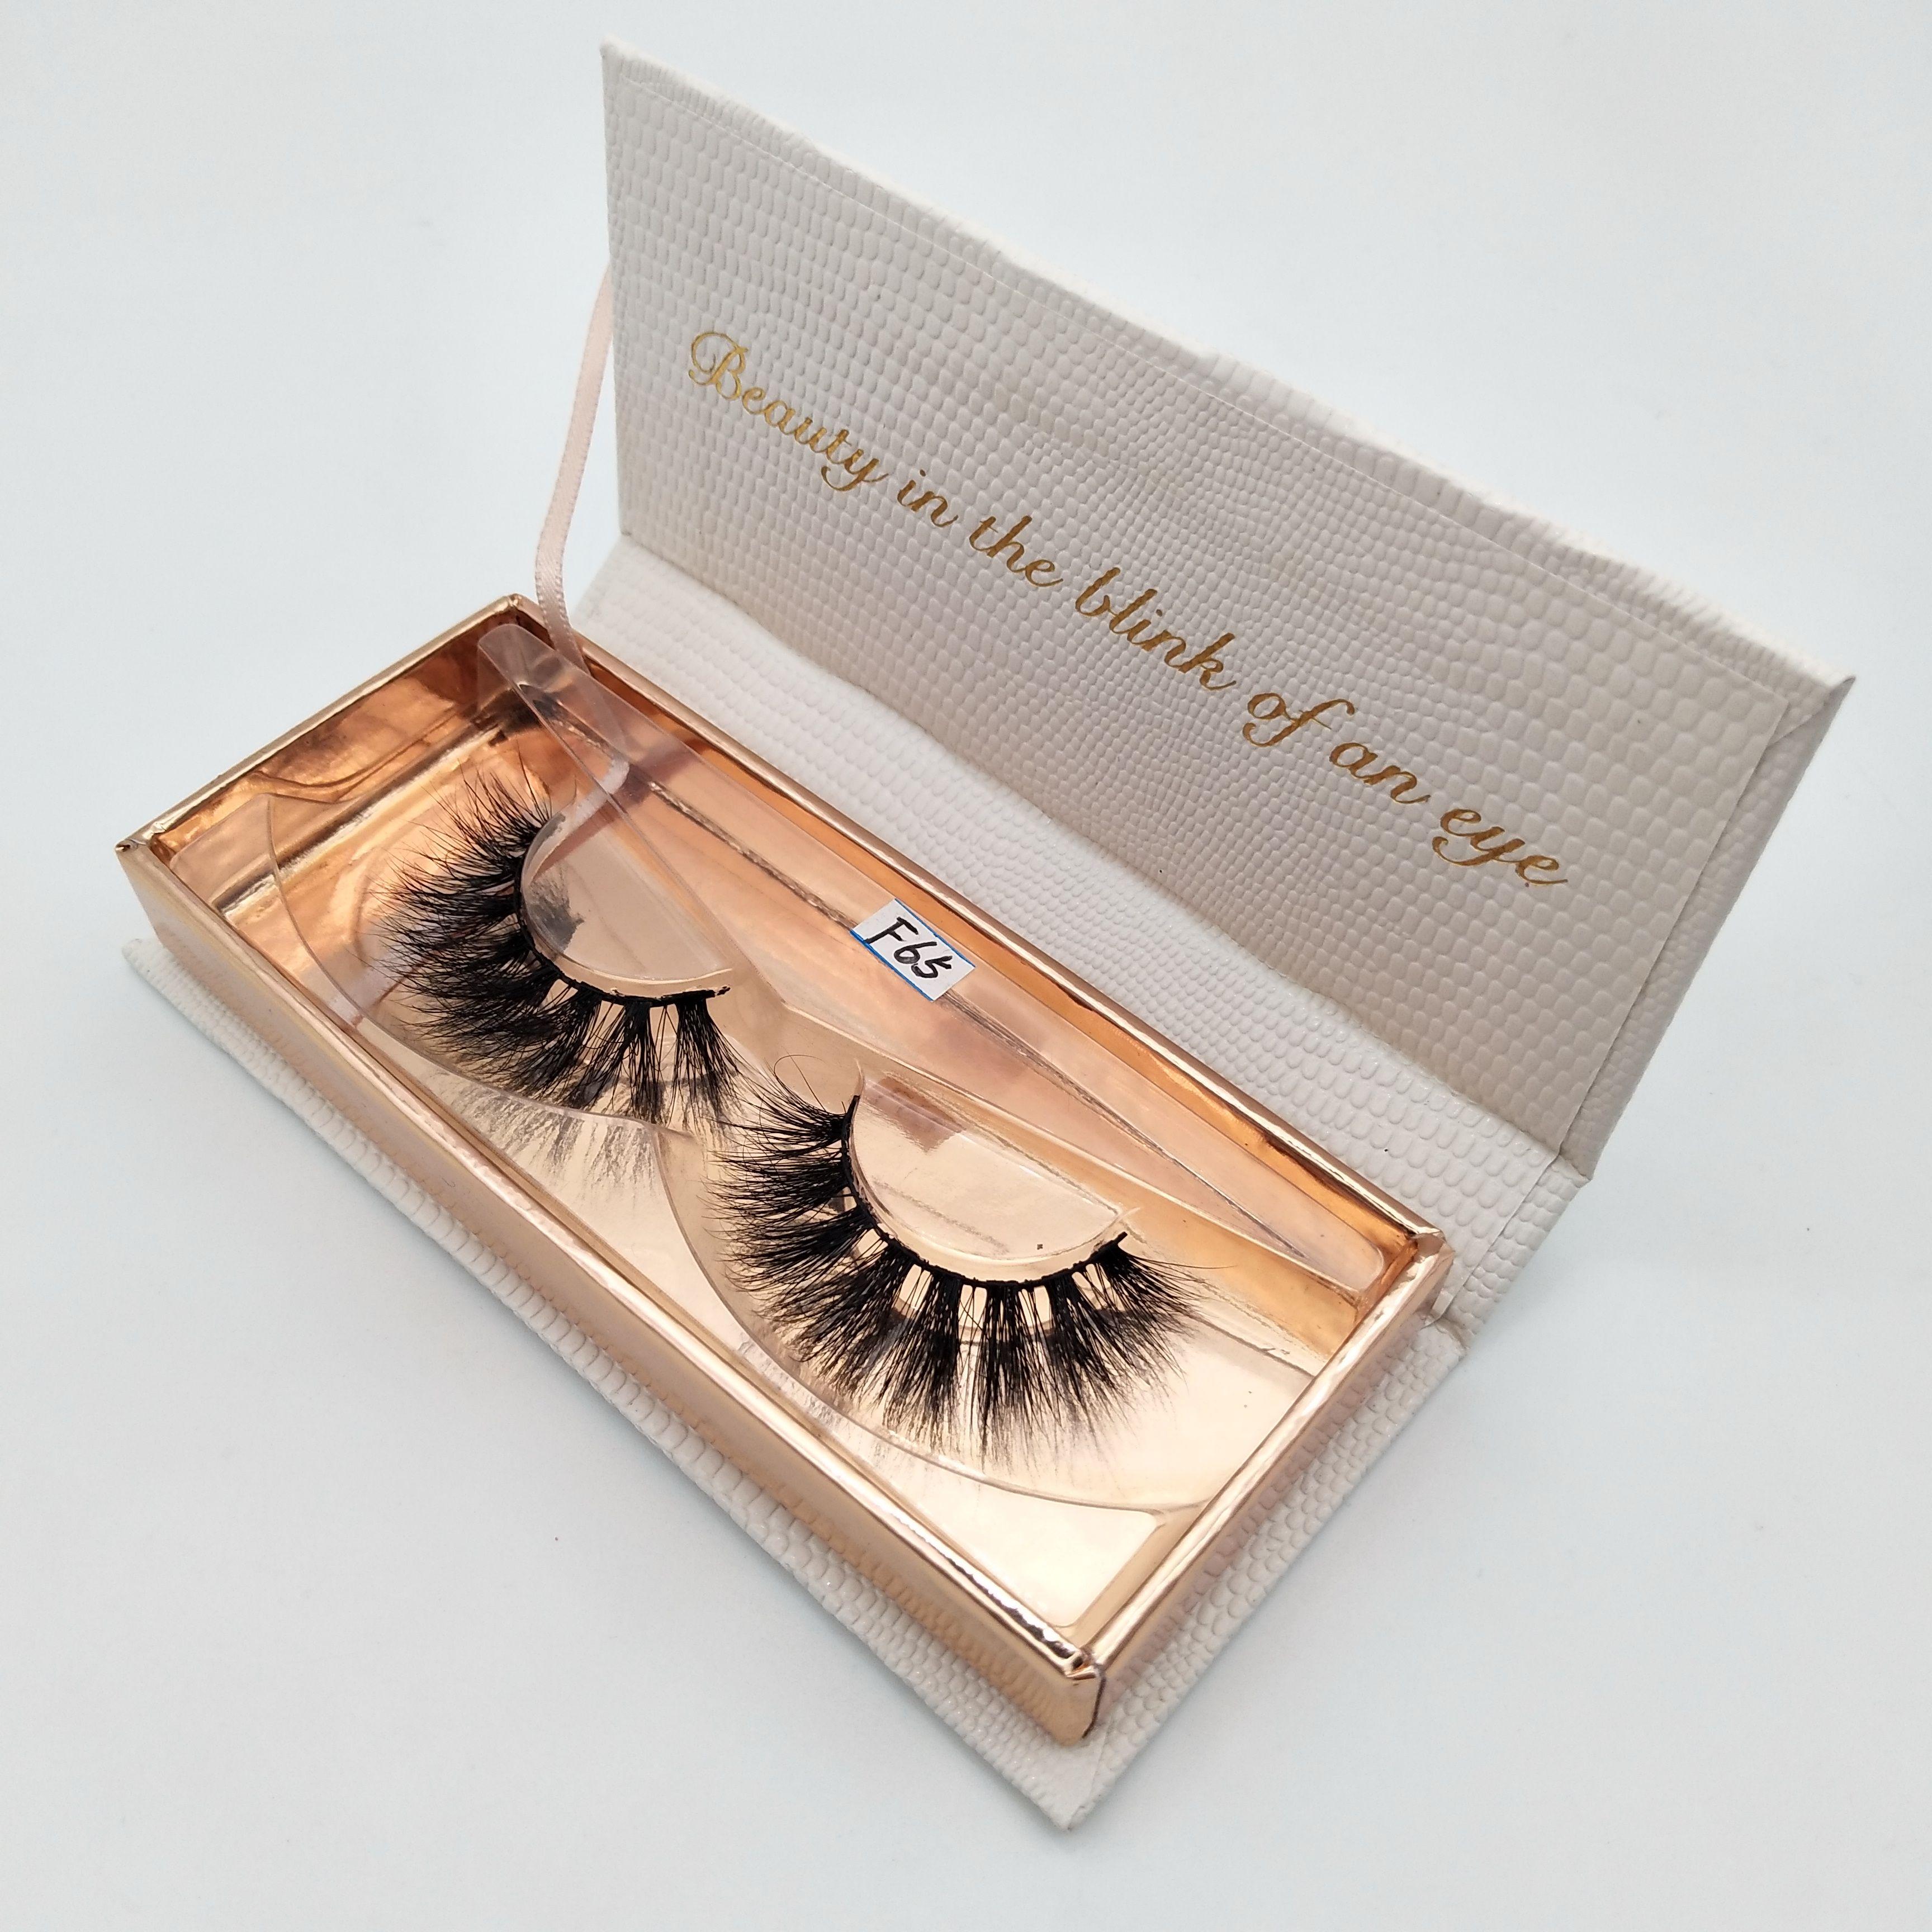 ce9255a7aa1 ... Cost Top Seller 20mm Lashes Charming Eyelashes 5D Mink Lashes,  WhatsApp:+86 18561673497 #makeup#beauty#eyelash#beautysalon#usasalon#uksalon#dubaisalon#  ...